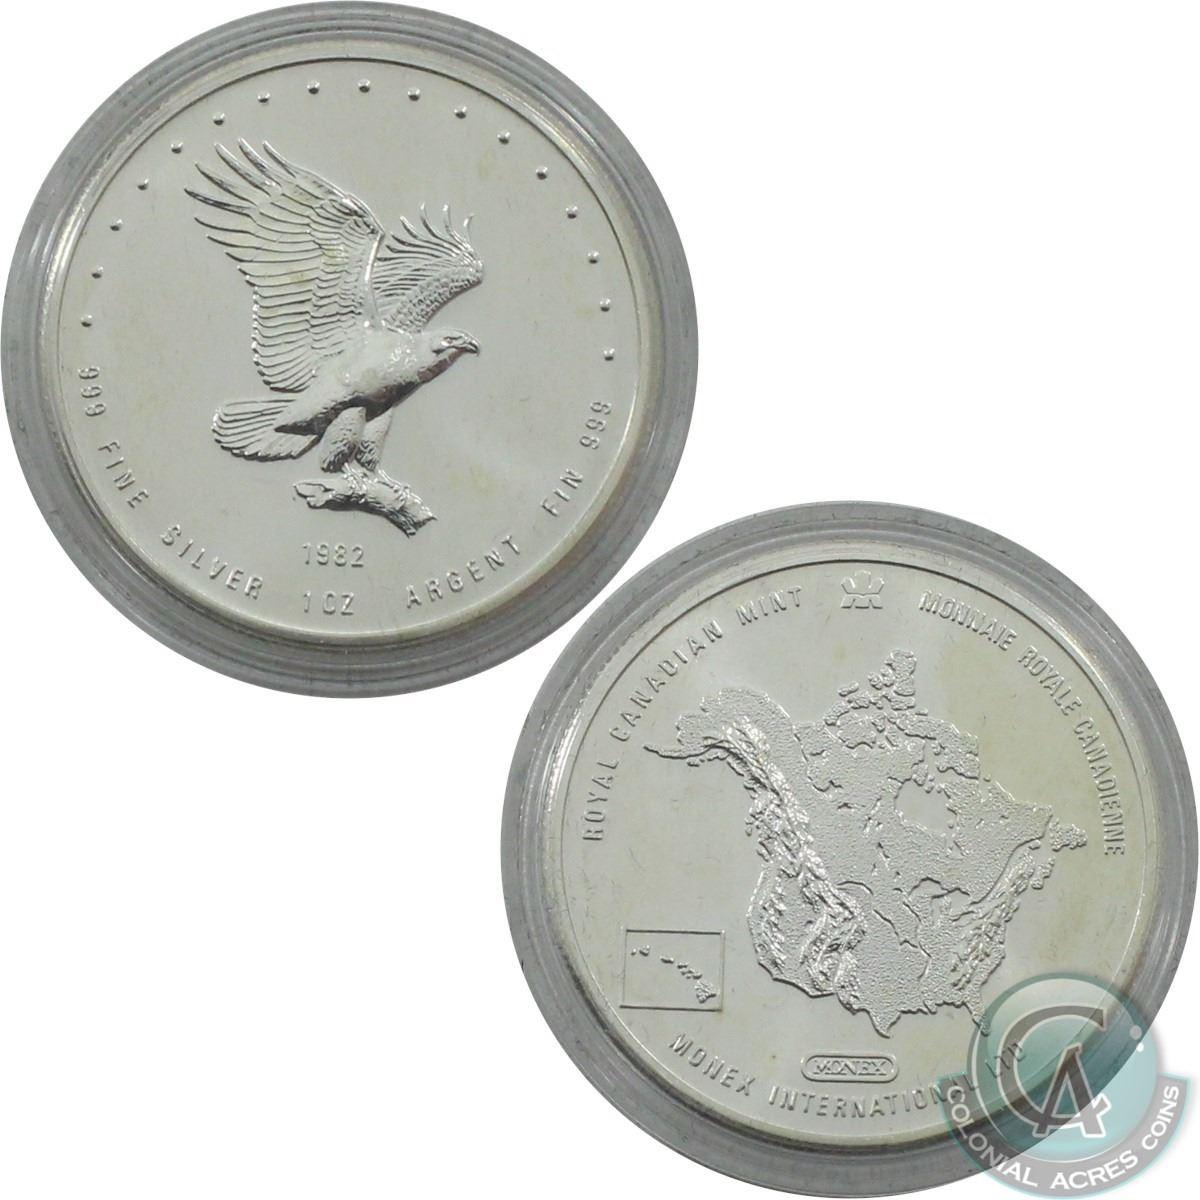 1982 Silver Eagle 1 oz .999 Fine Silver Round Monex International LTD